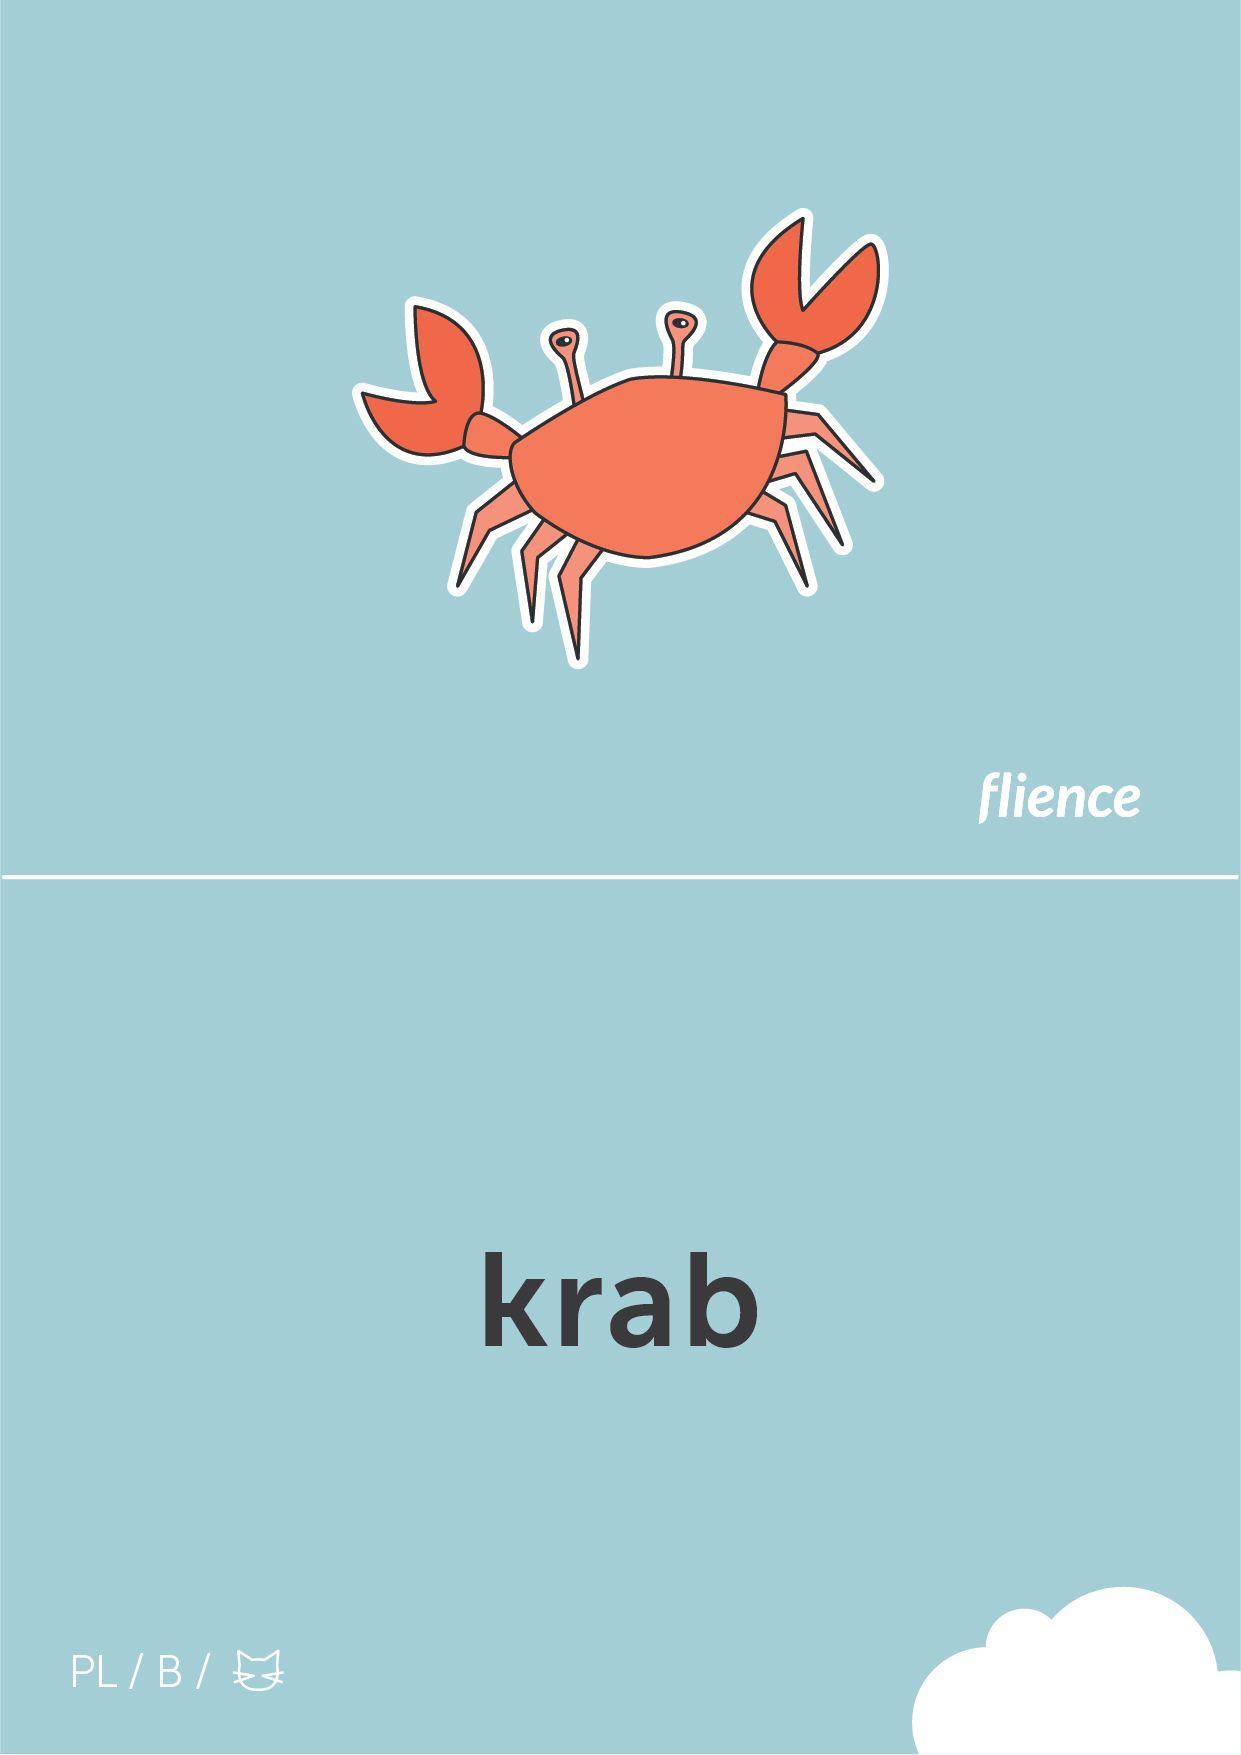 Pin By Flience On Polish Flashcards Italian Language Learning Italian French Flashcards